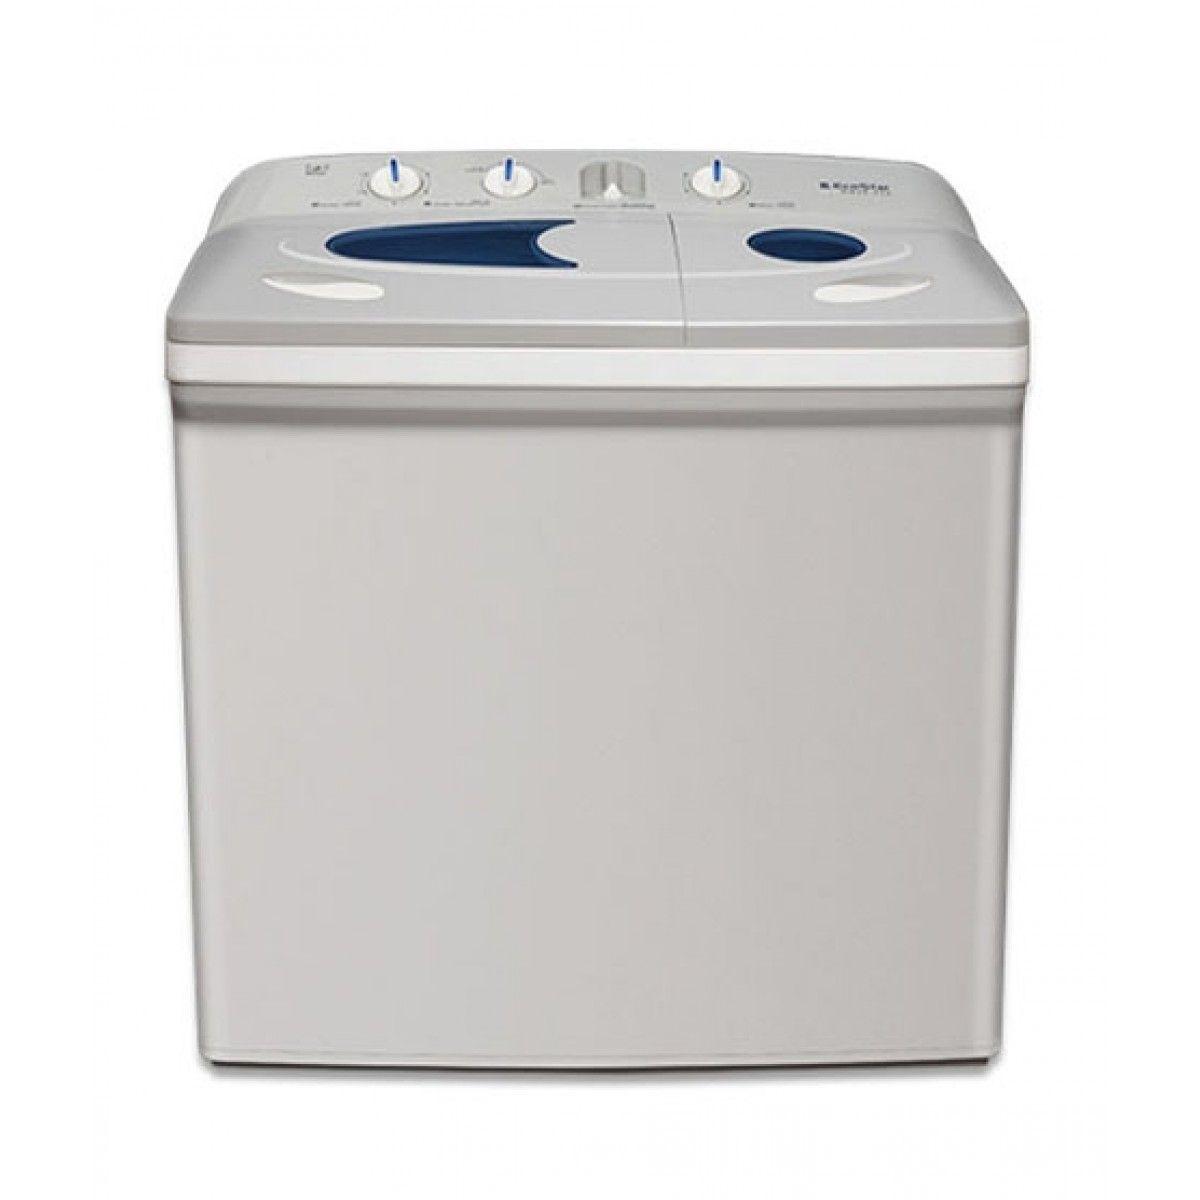 EcoStar WM-08-500 8KG Washing Machine (Semi Automatic)